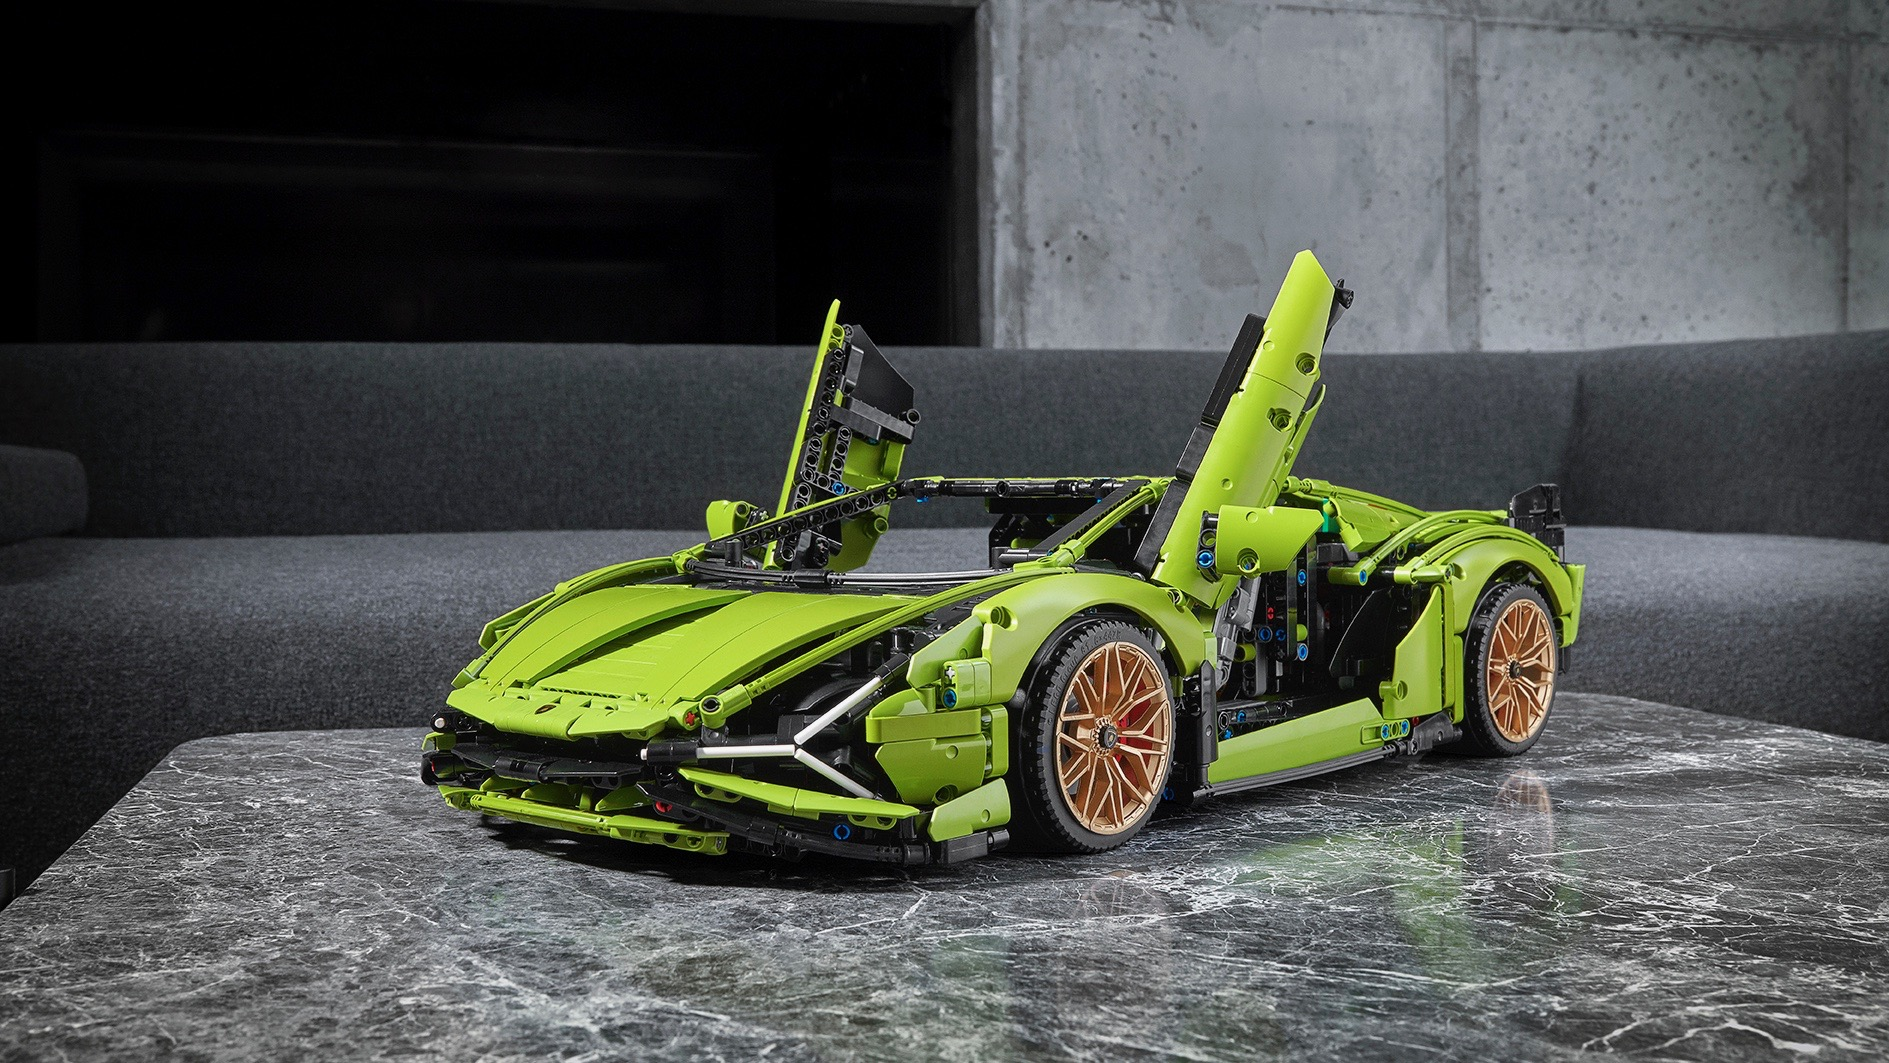 This Lego Technic Lamborghini Sian FKP 37 has 3,696 pieces - Motor Authority